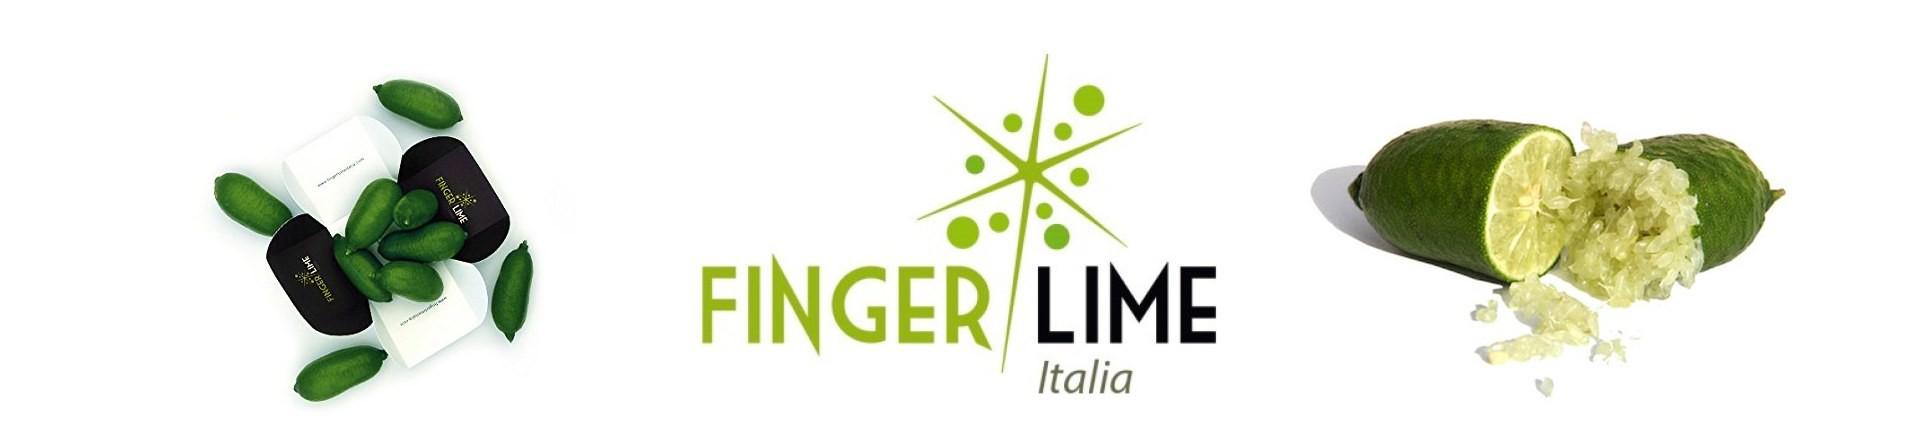 Finger Lime, limone caviale - FINGER LIME ITALIA